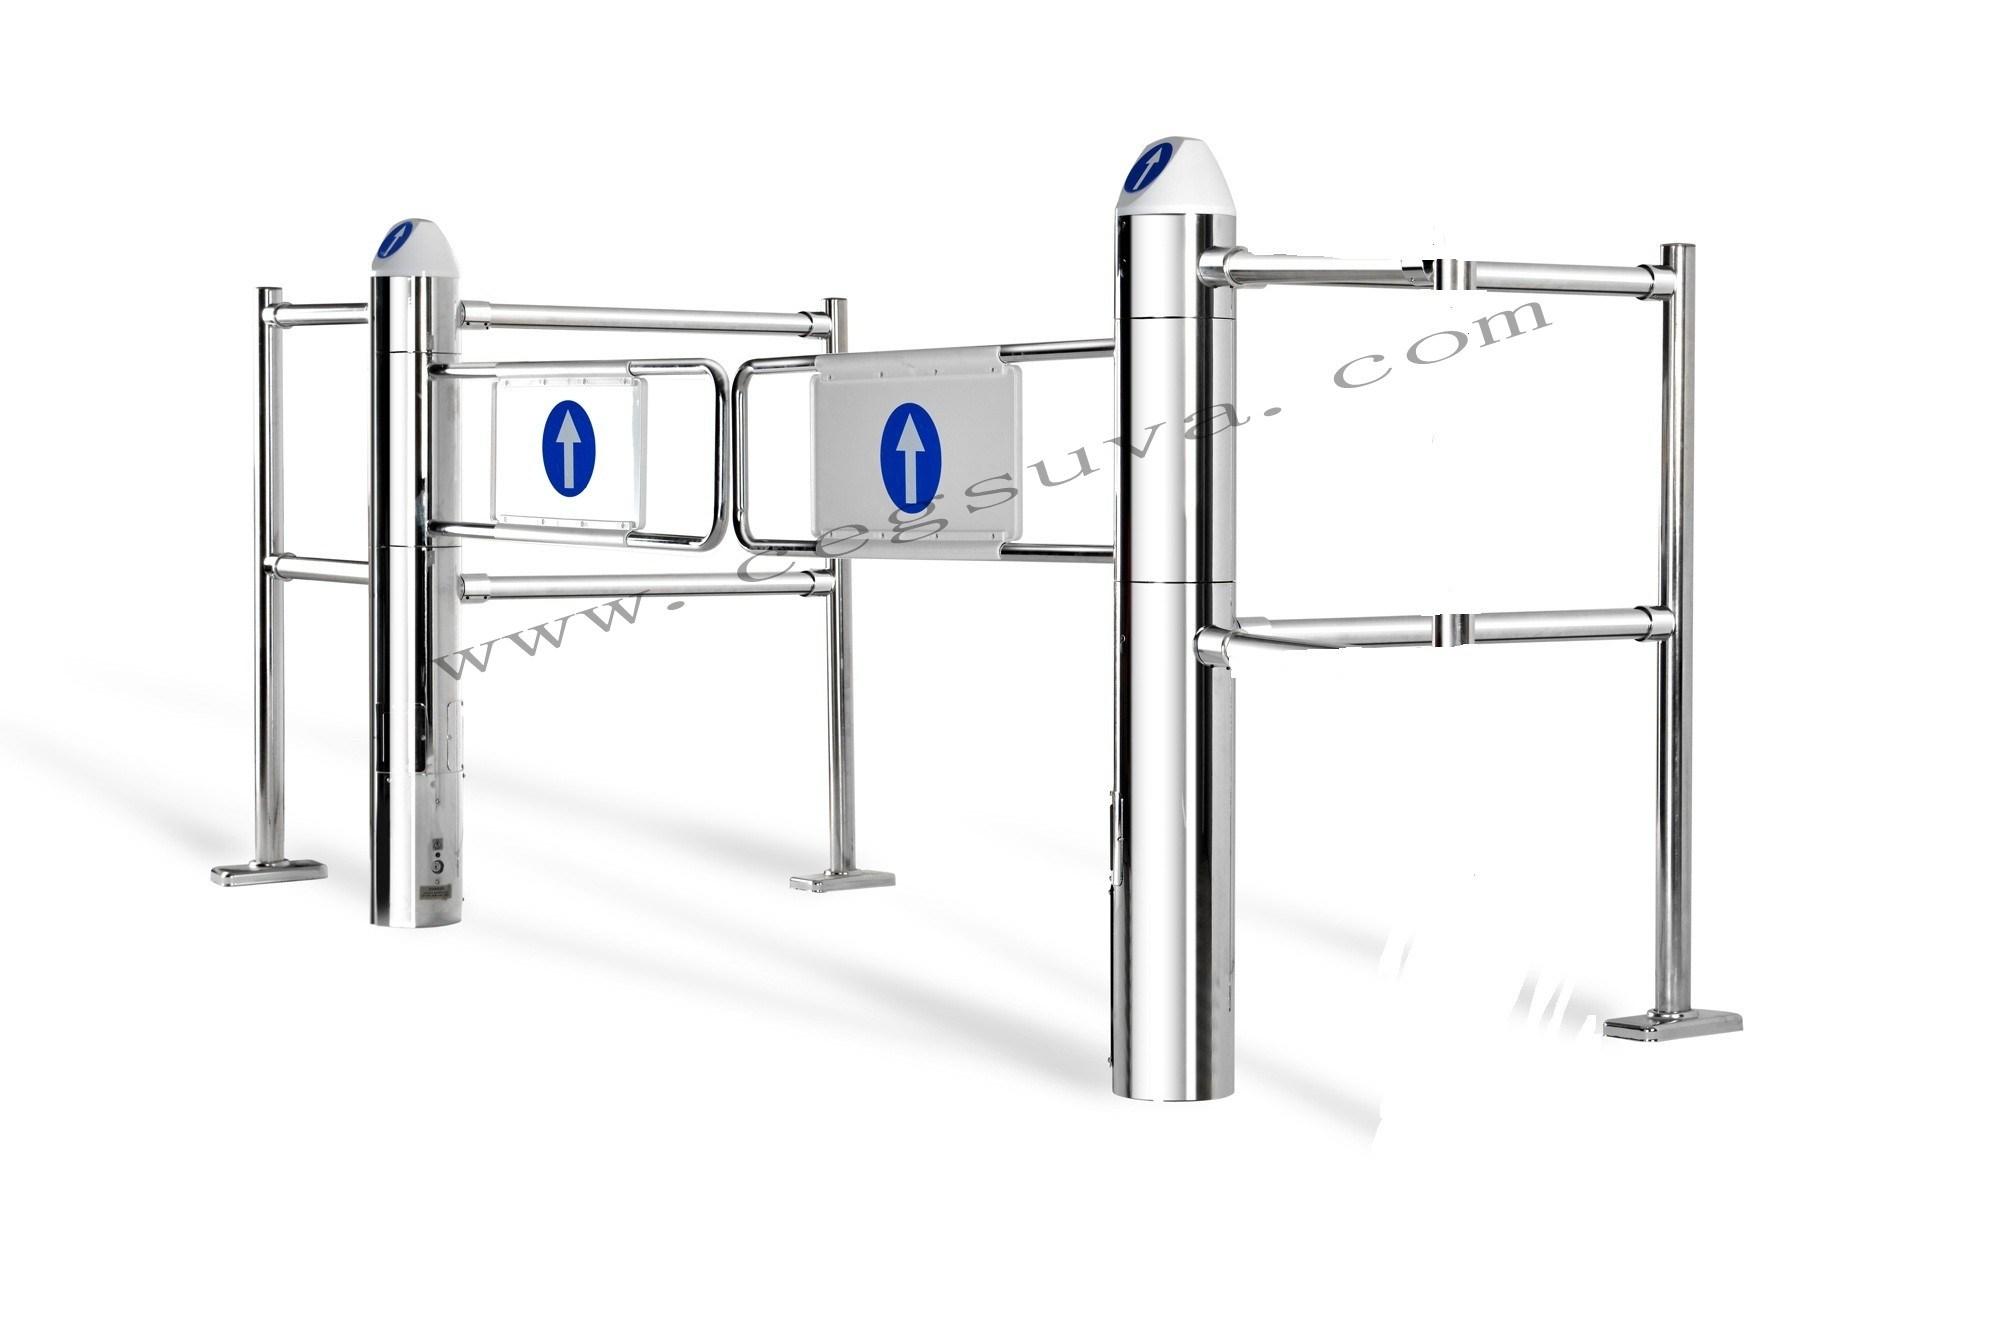 (CE) Supermarket Entrance Gate, Electric Gate, Automatic Gate, Rotogate, Swing Gate